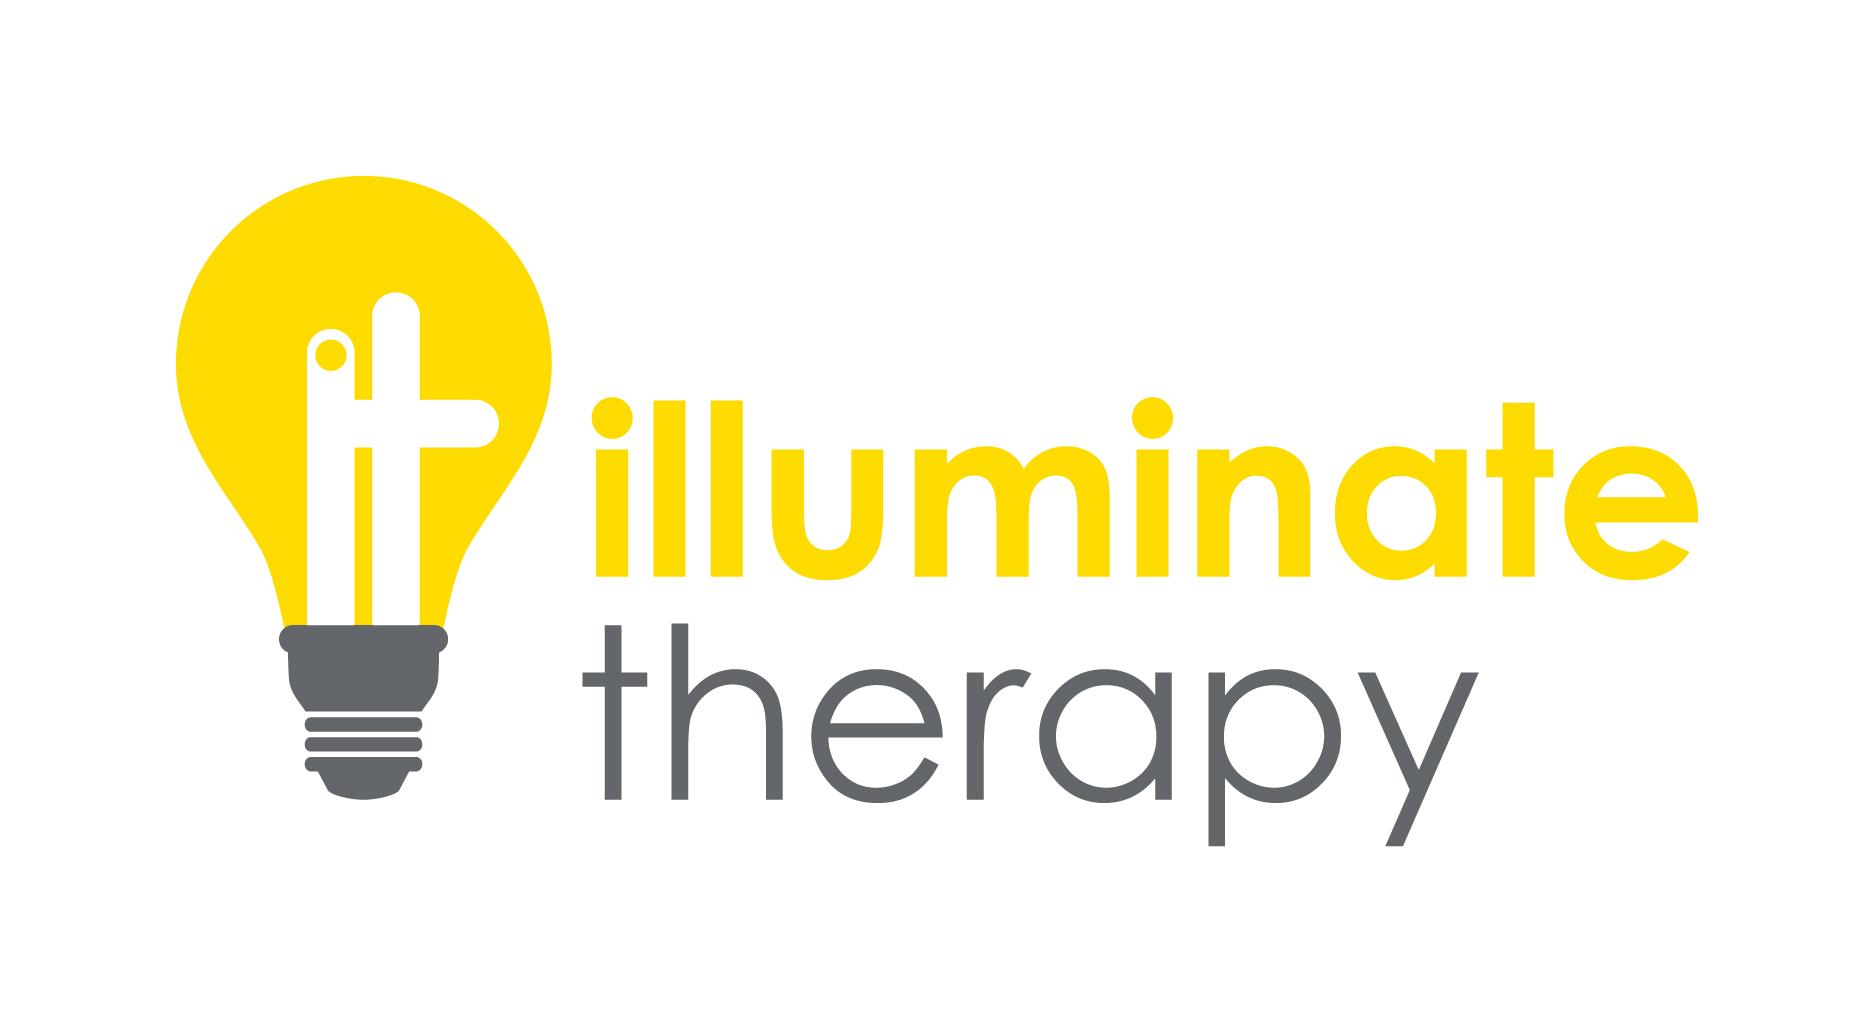 Illuminate Therapy